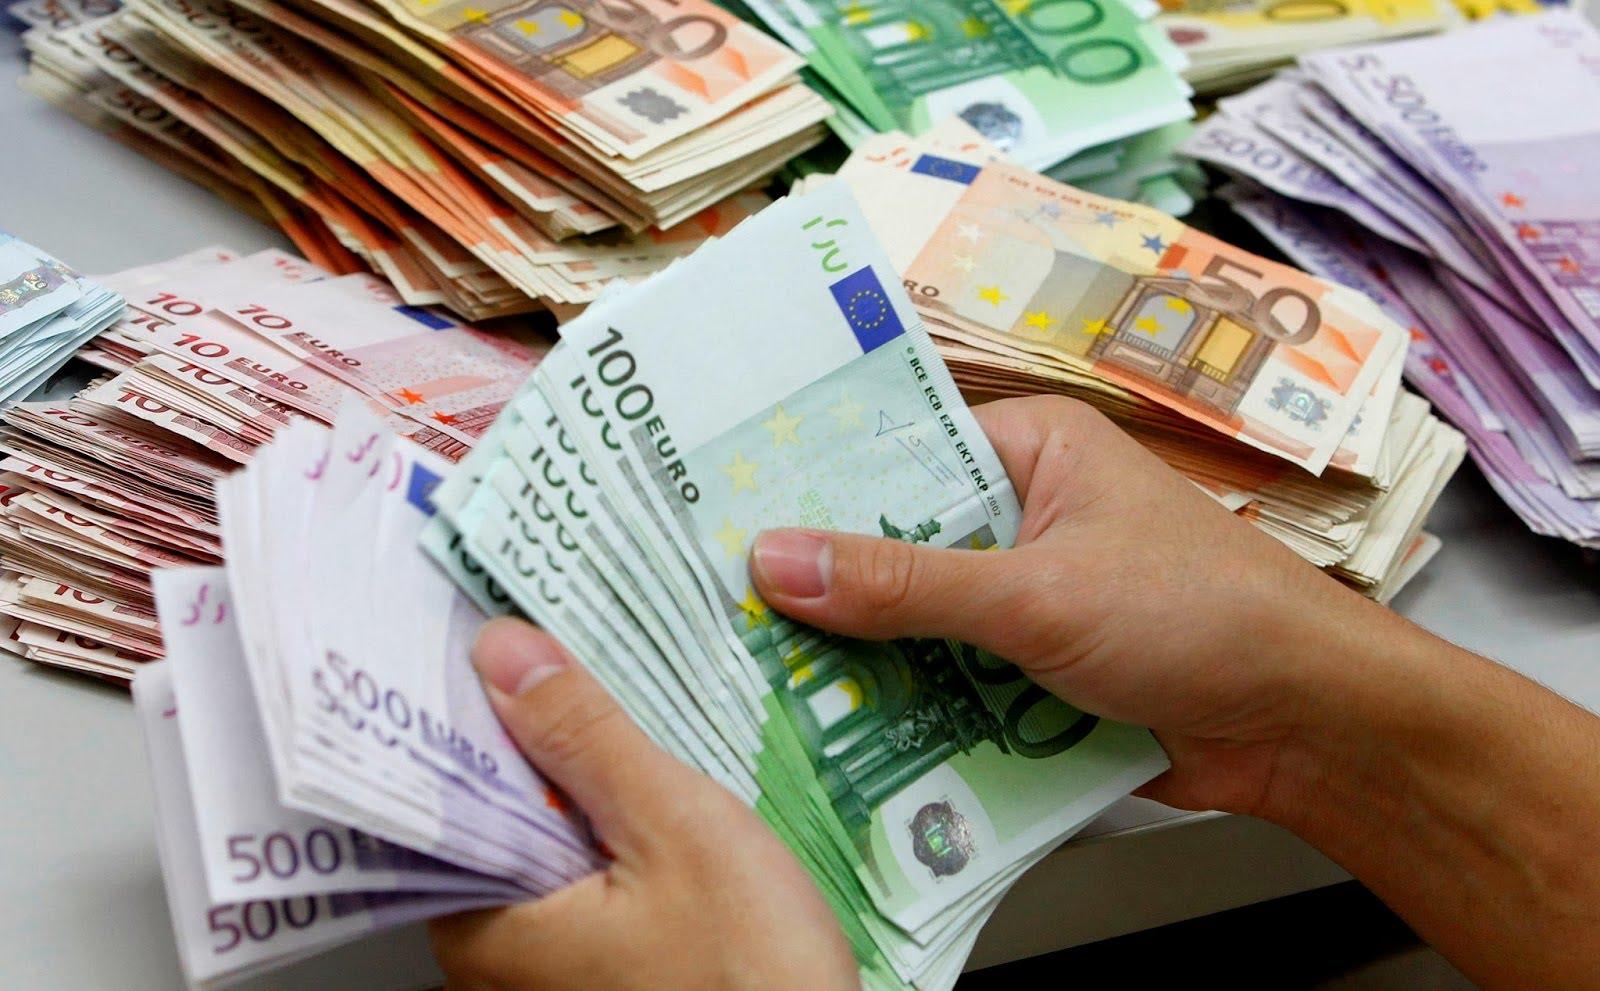 Revenue growth in October